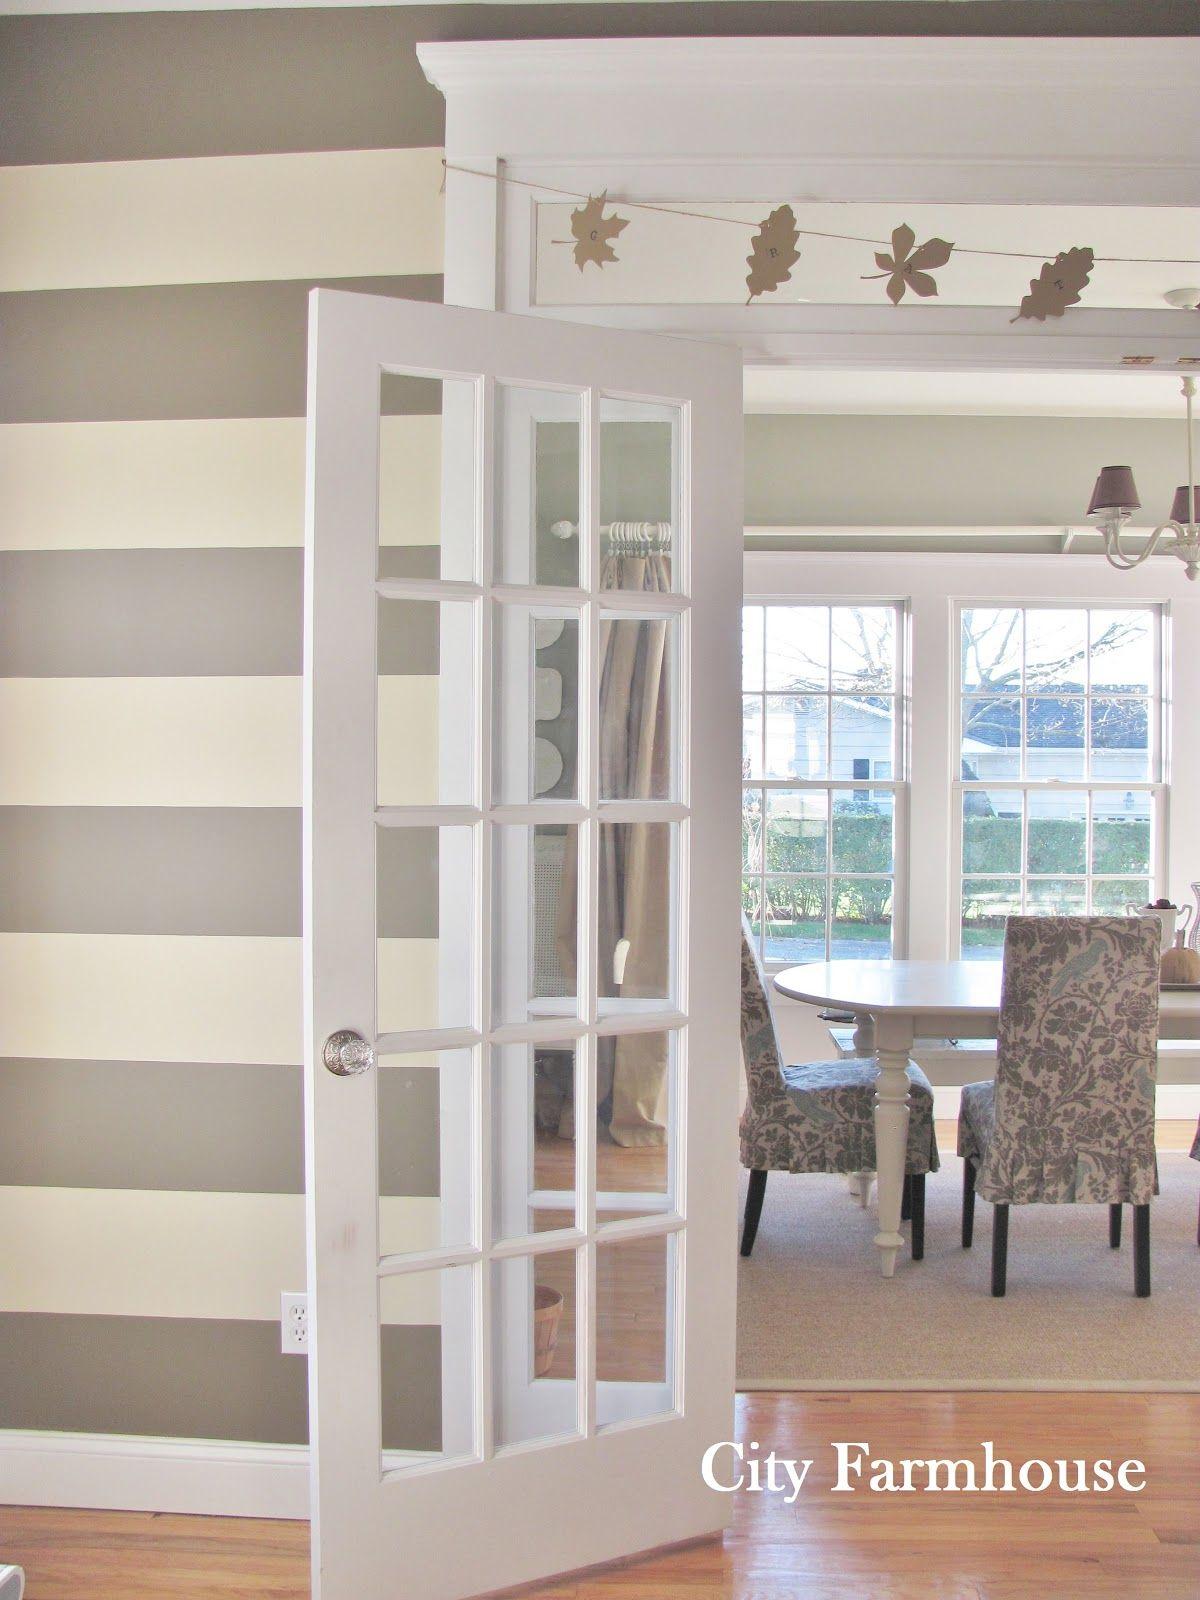 Contact Paper Wall Stripes Striped Walls Diy Apartments Home